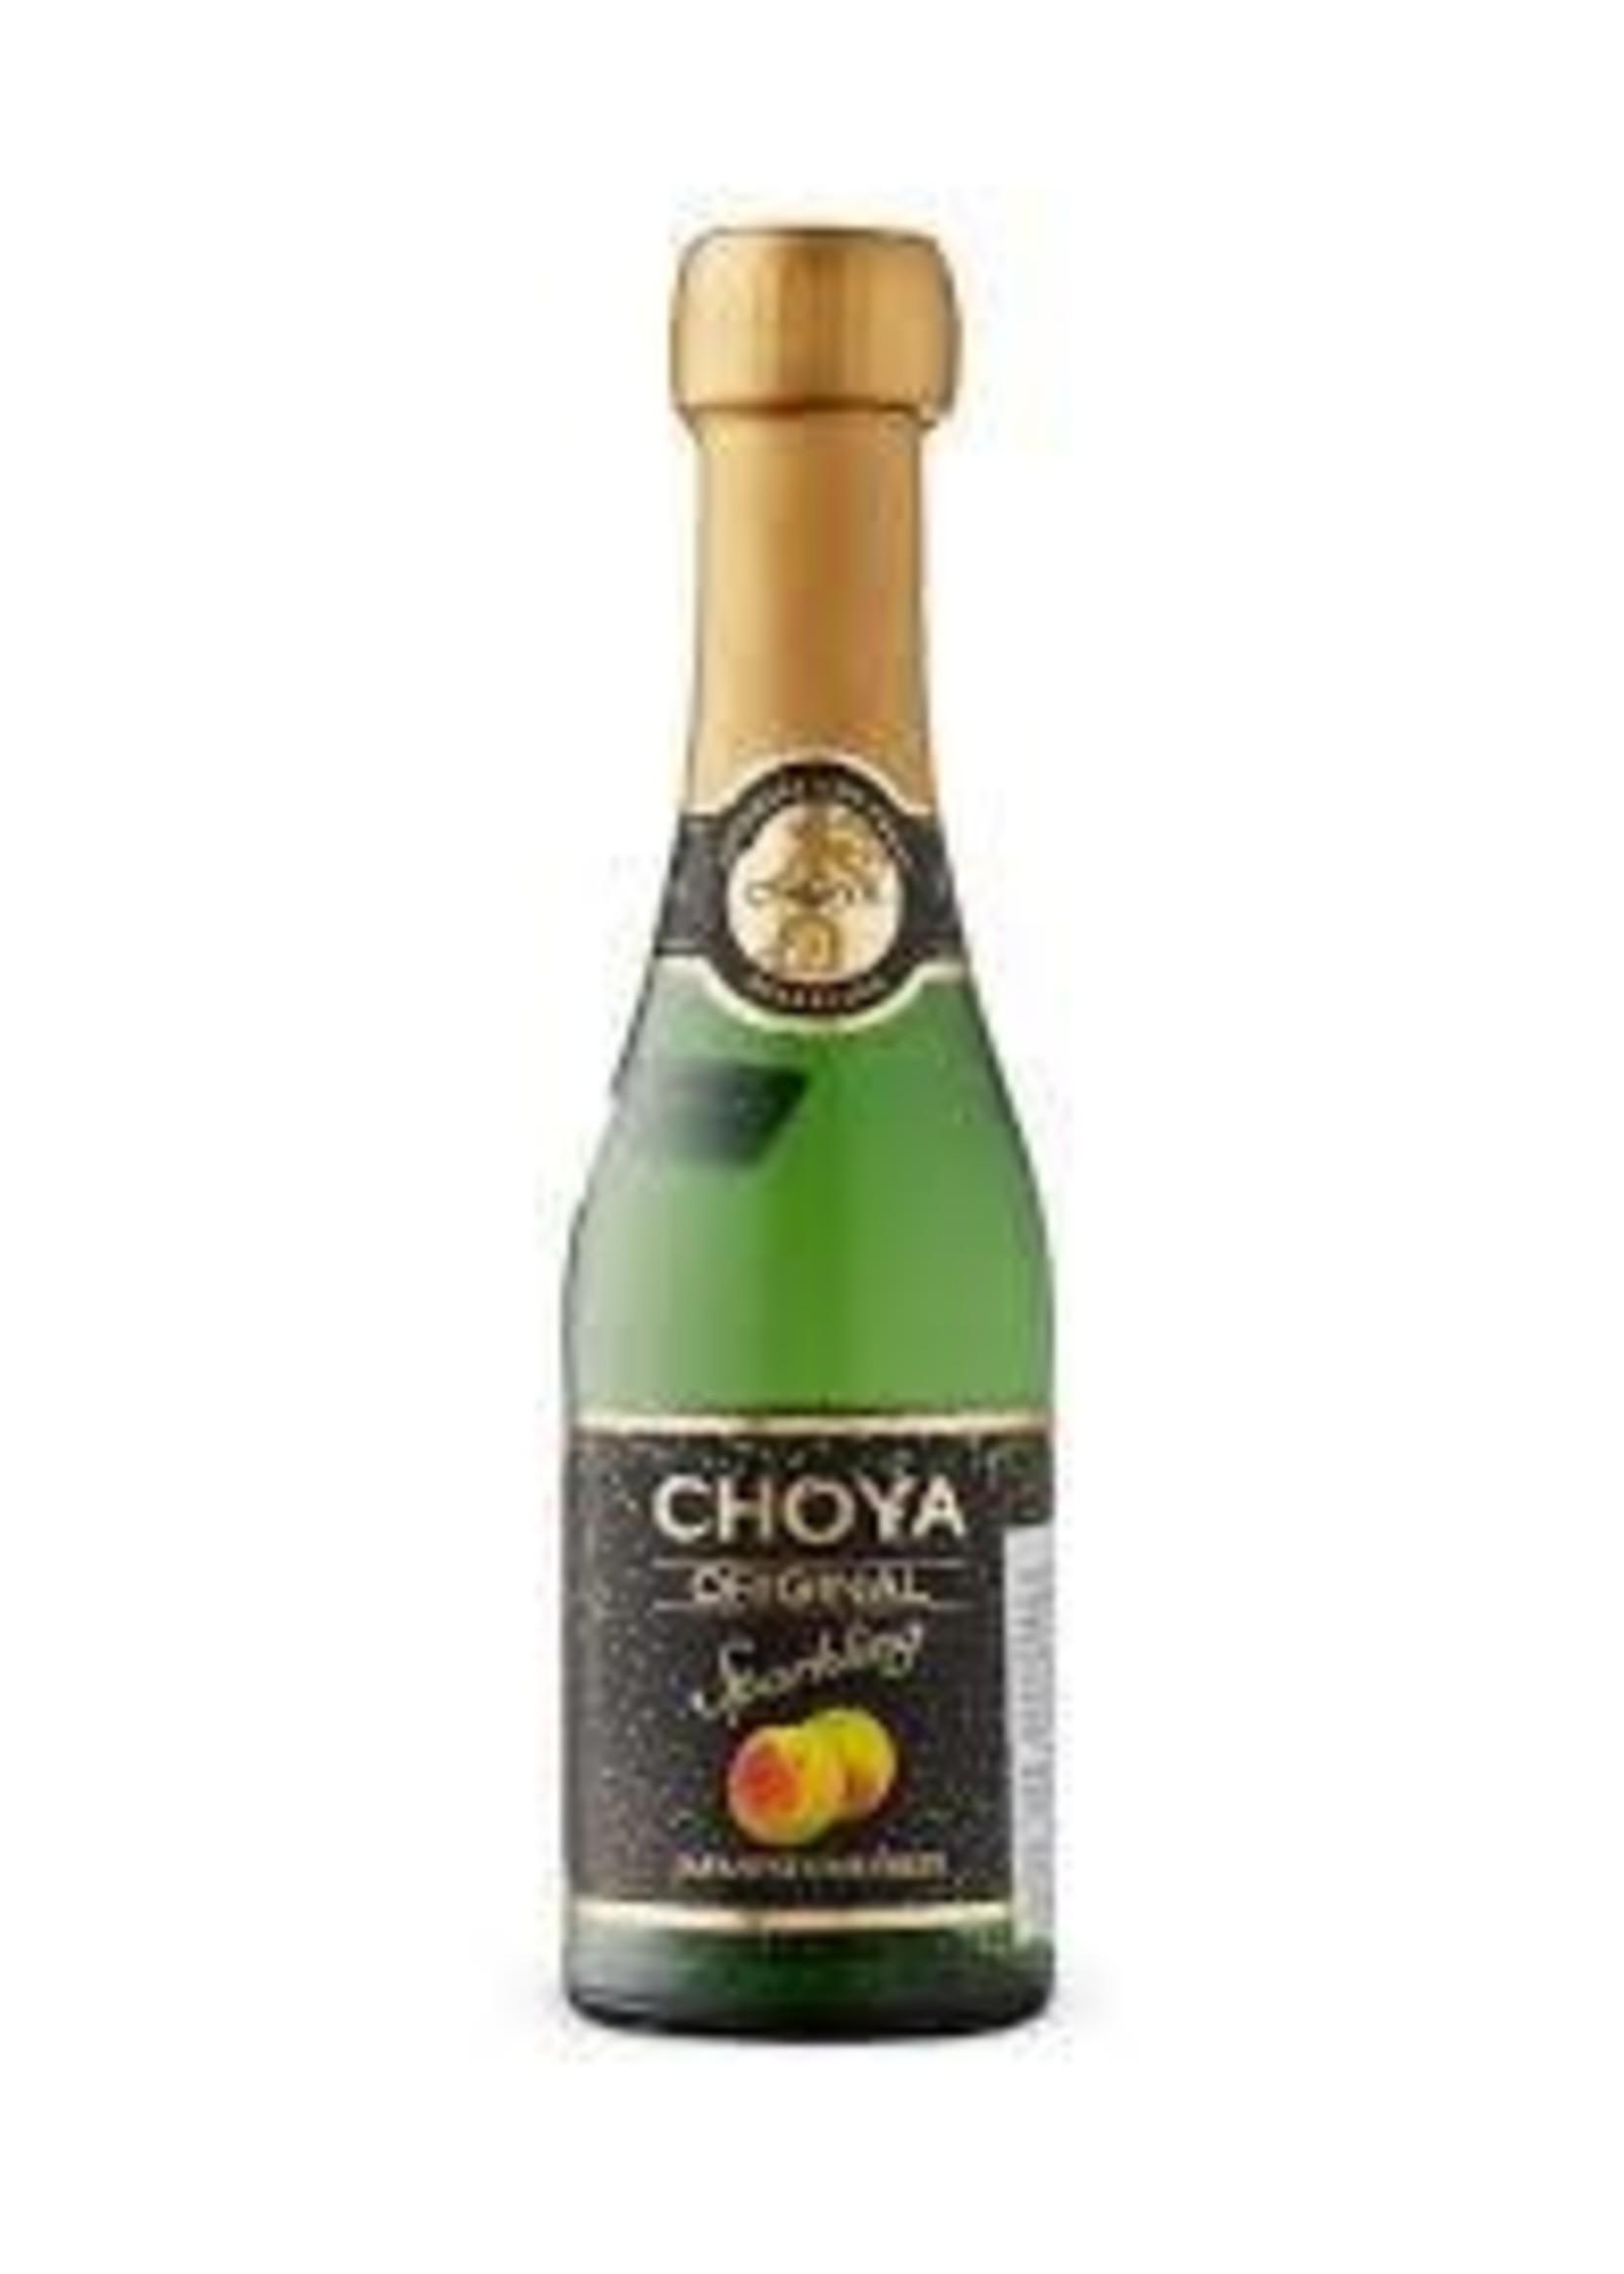 Choya Choya / Original / Sparkling Plum Wine / 187mL